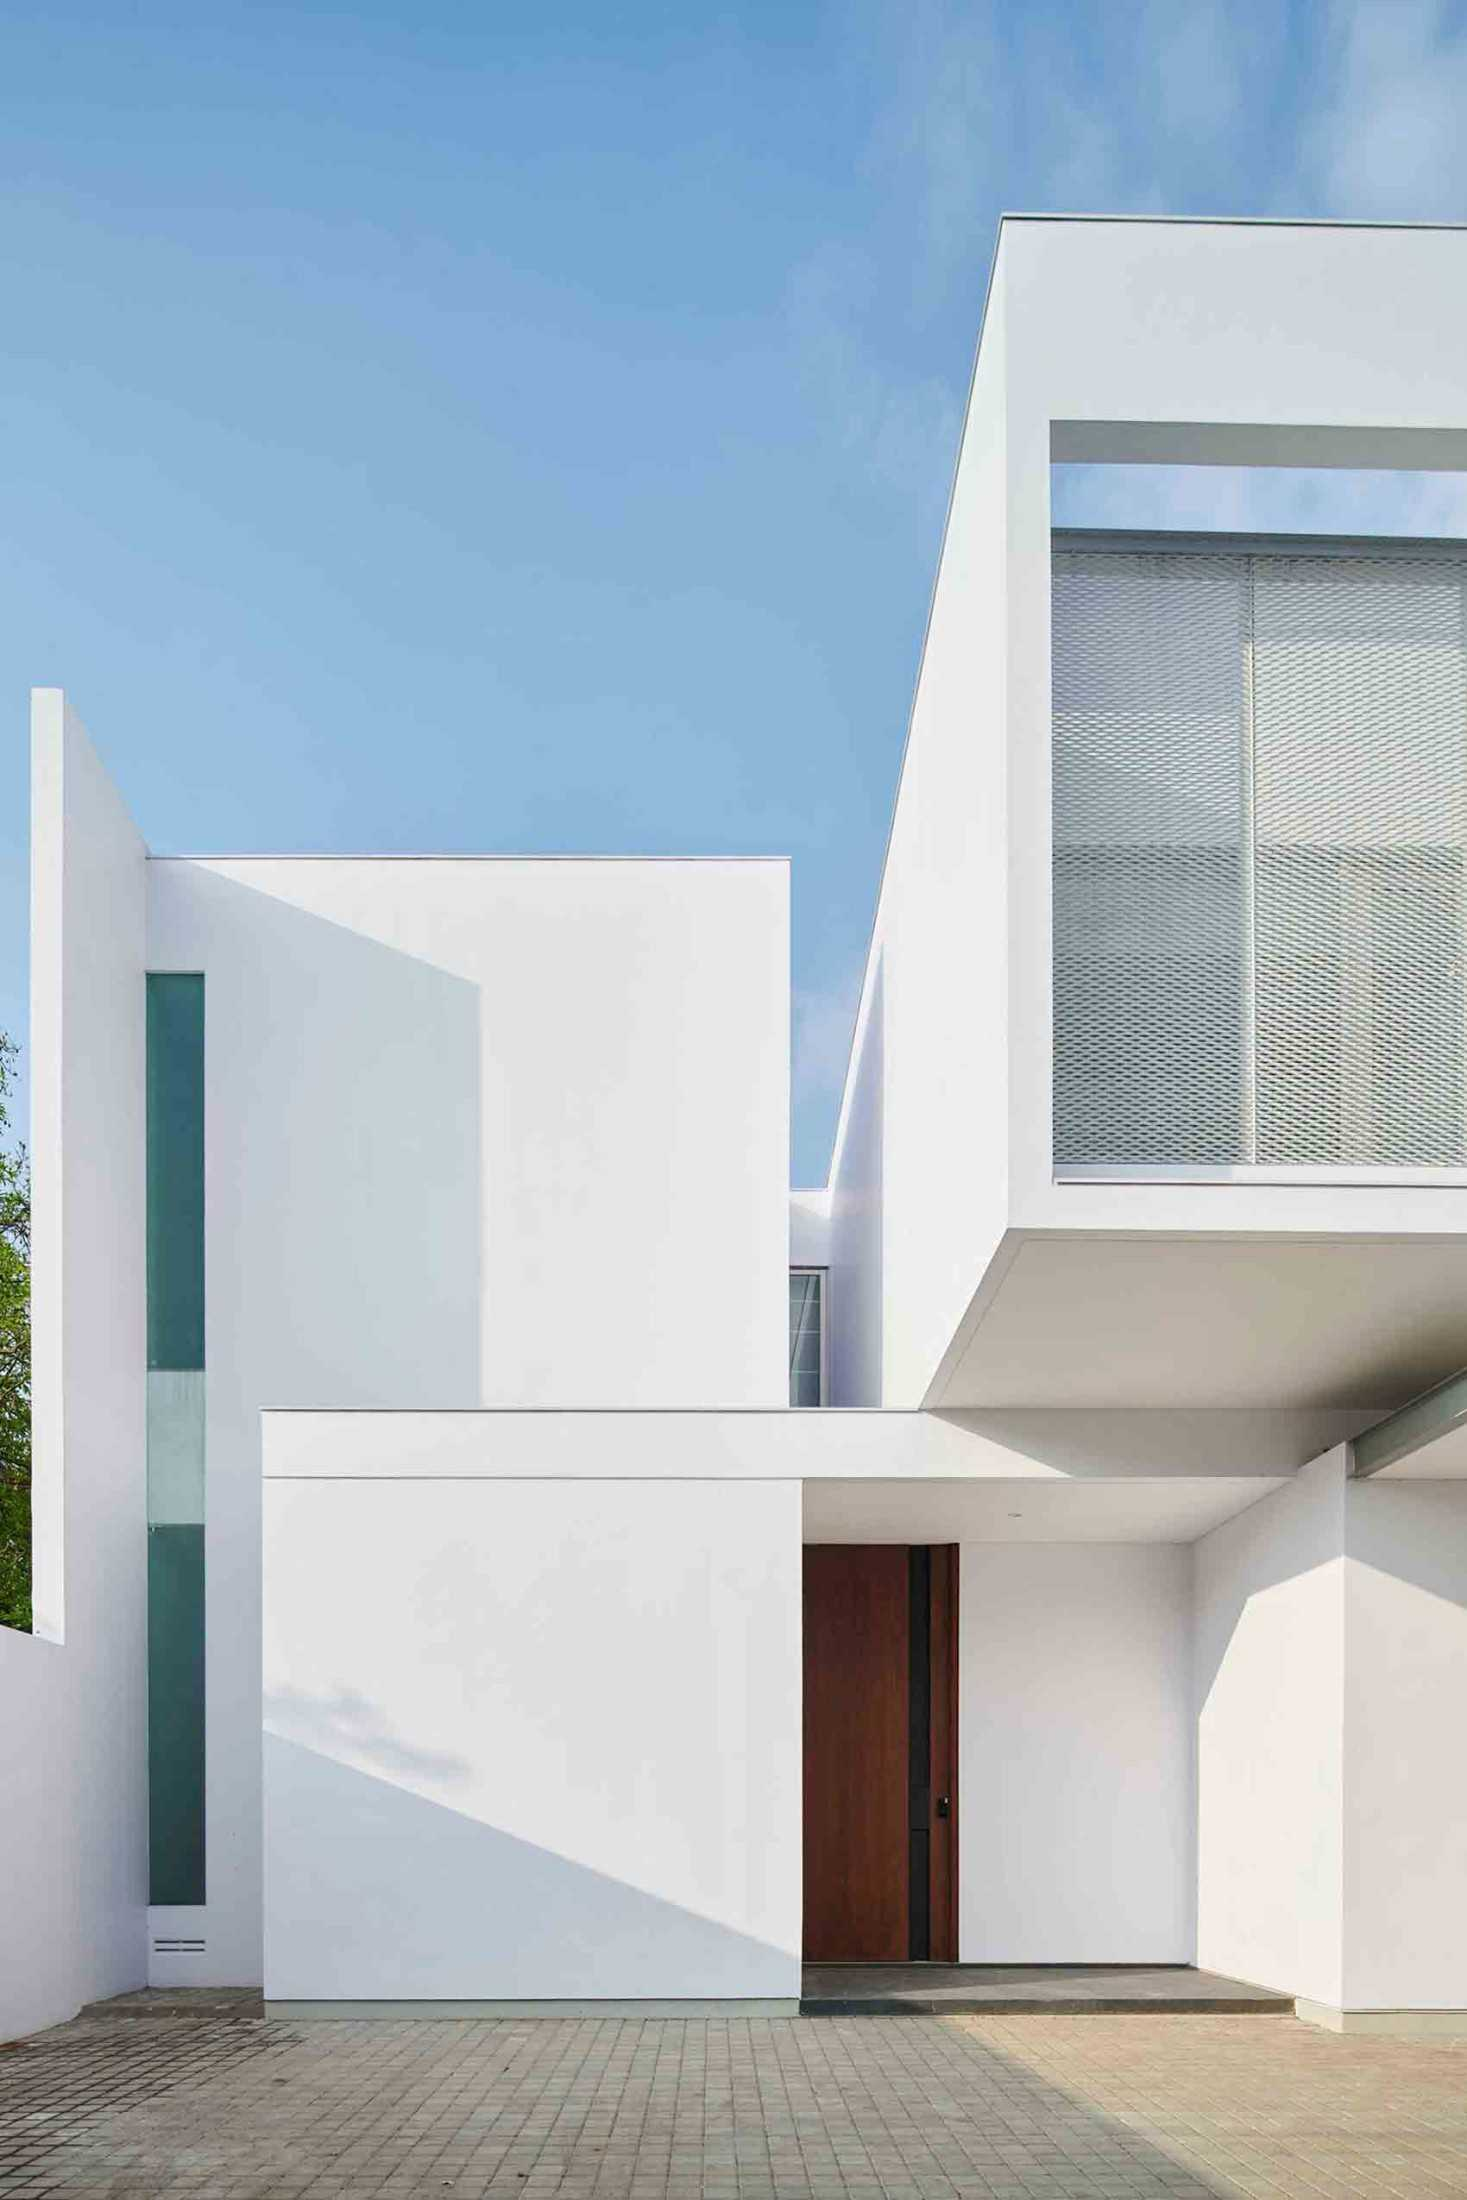 VY House, rumah minimalis serba putih, karya Rakta Studio, via arsitag.com